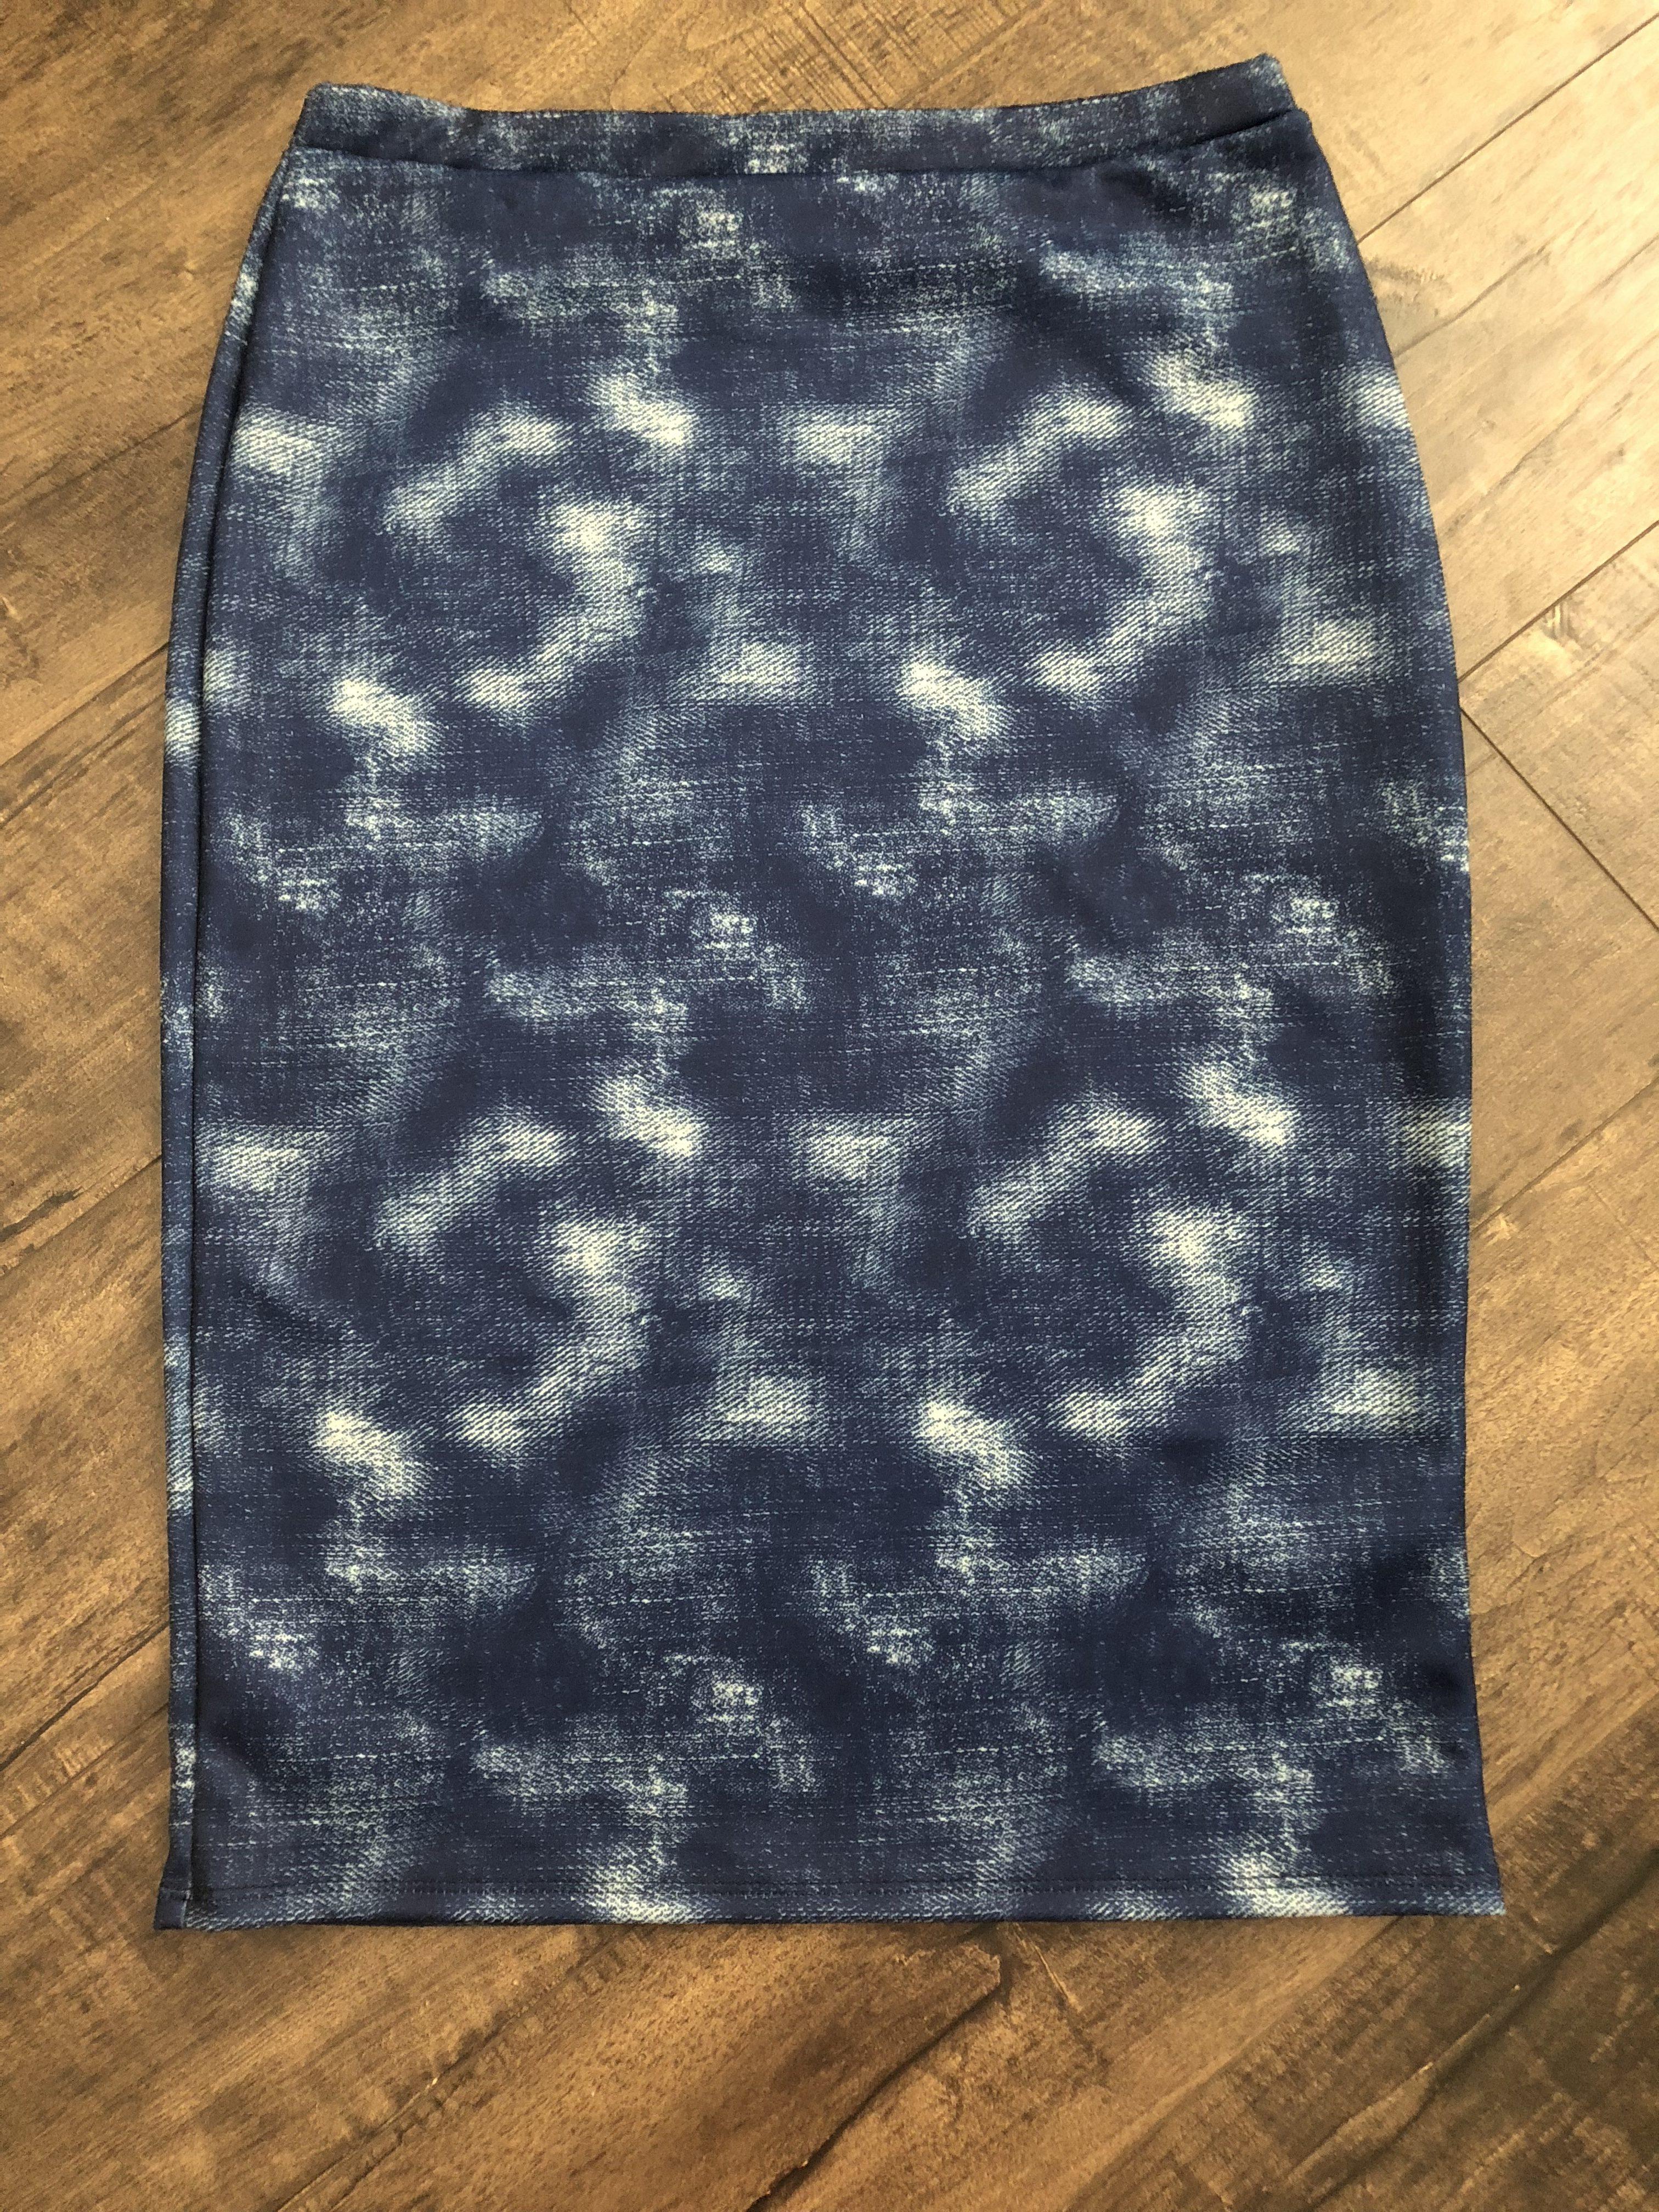 Brushed denim pencil skirt